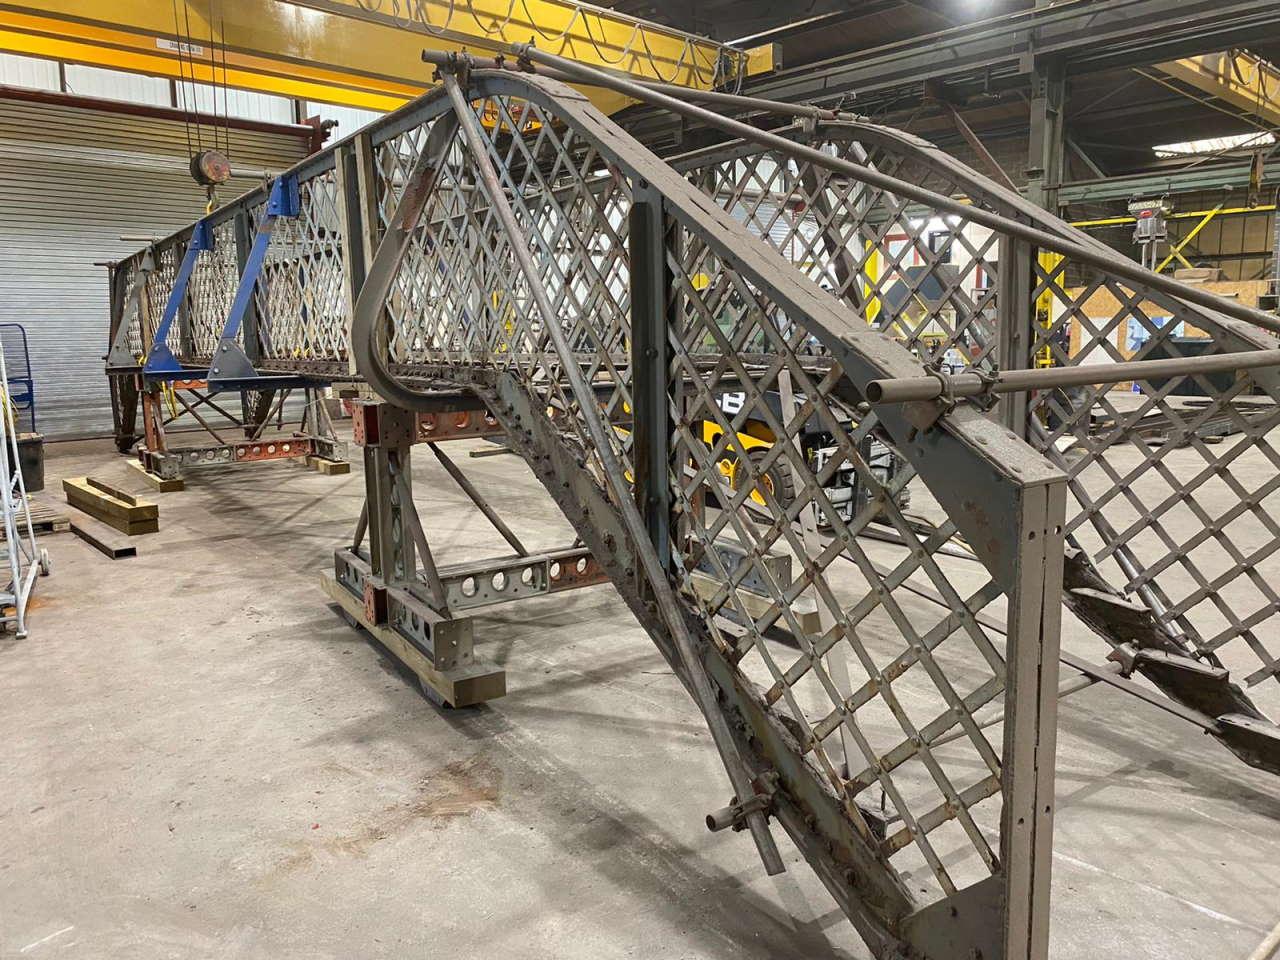 Narborough footbridge repair work after grit blasting